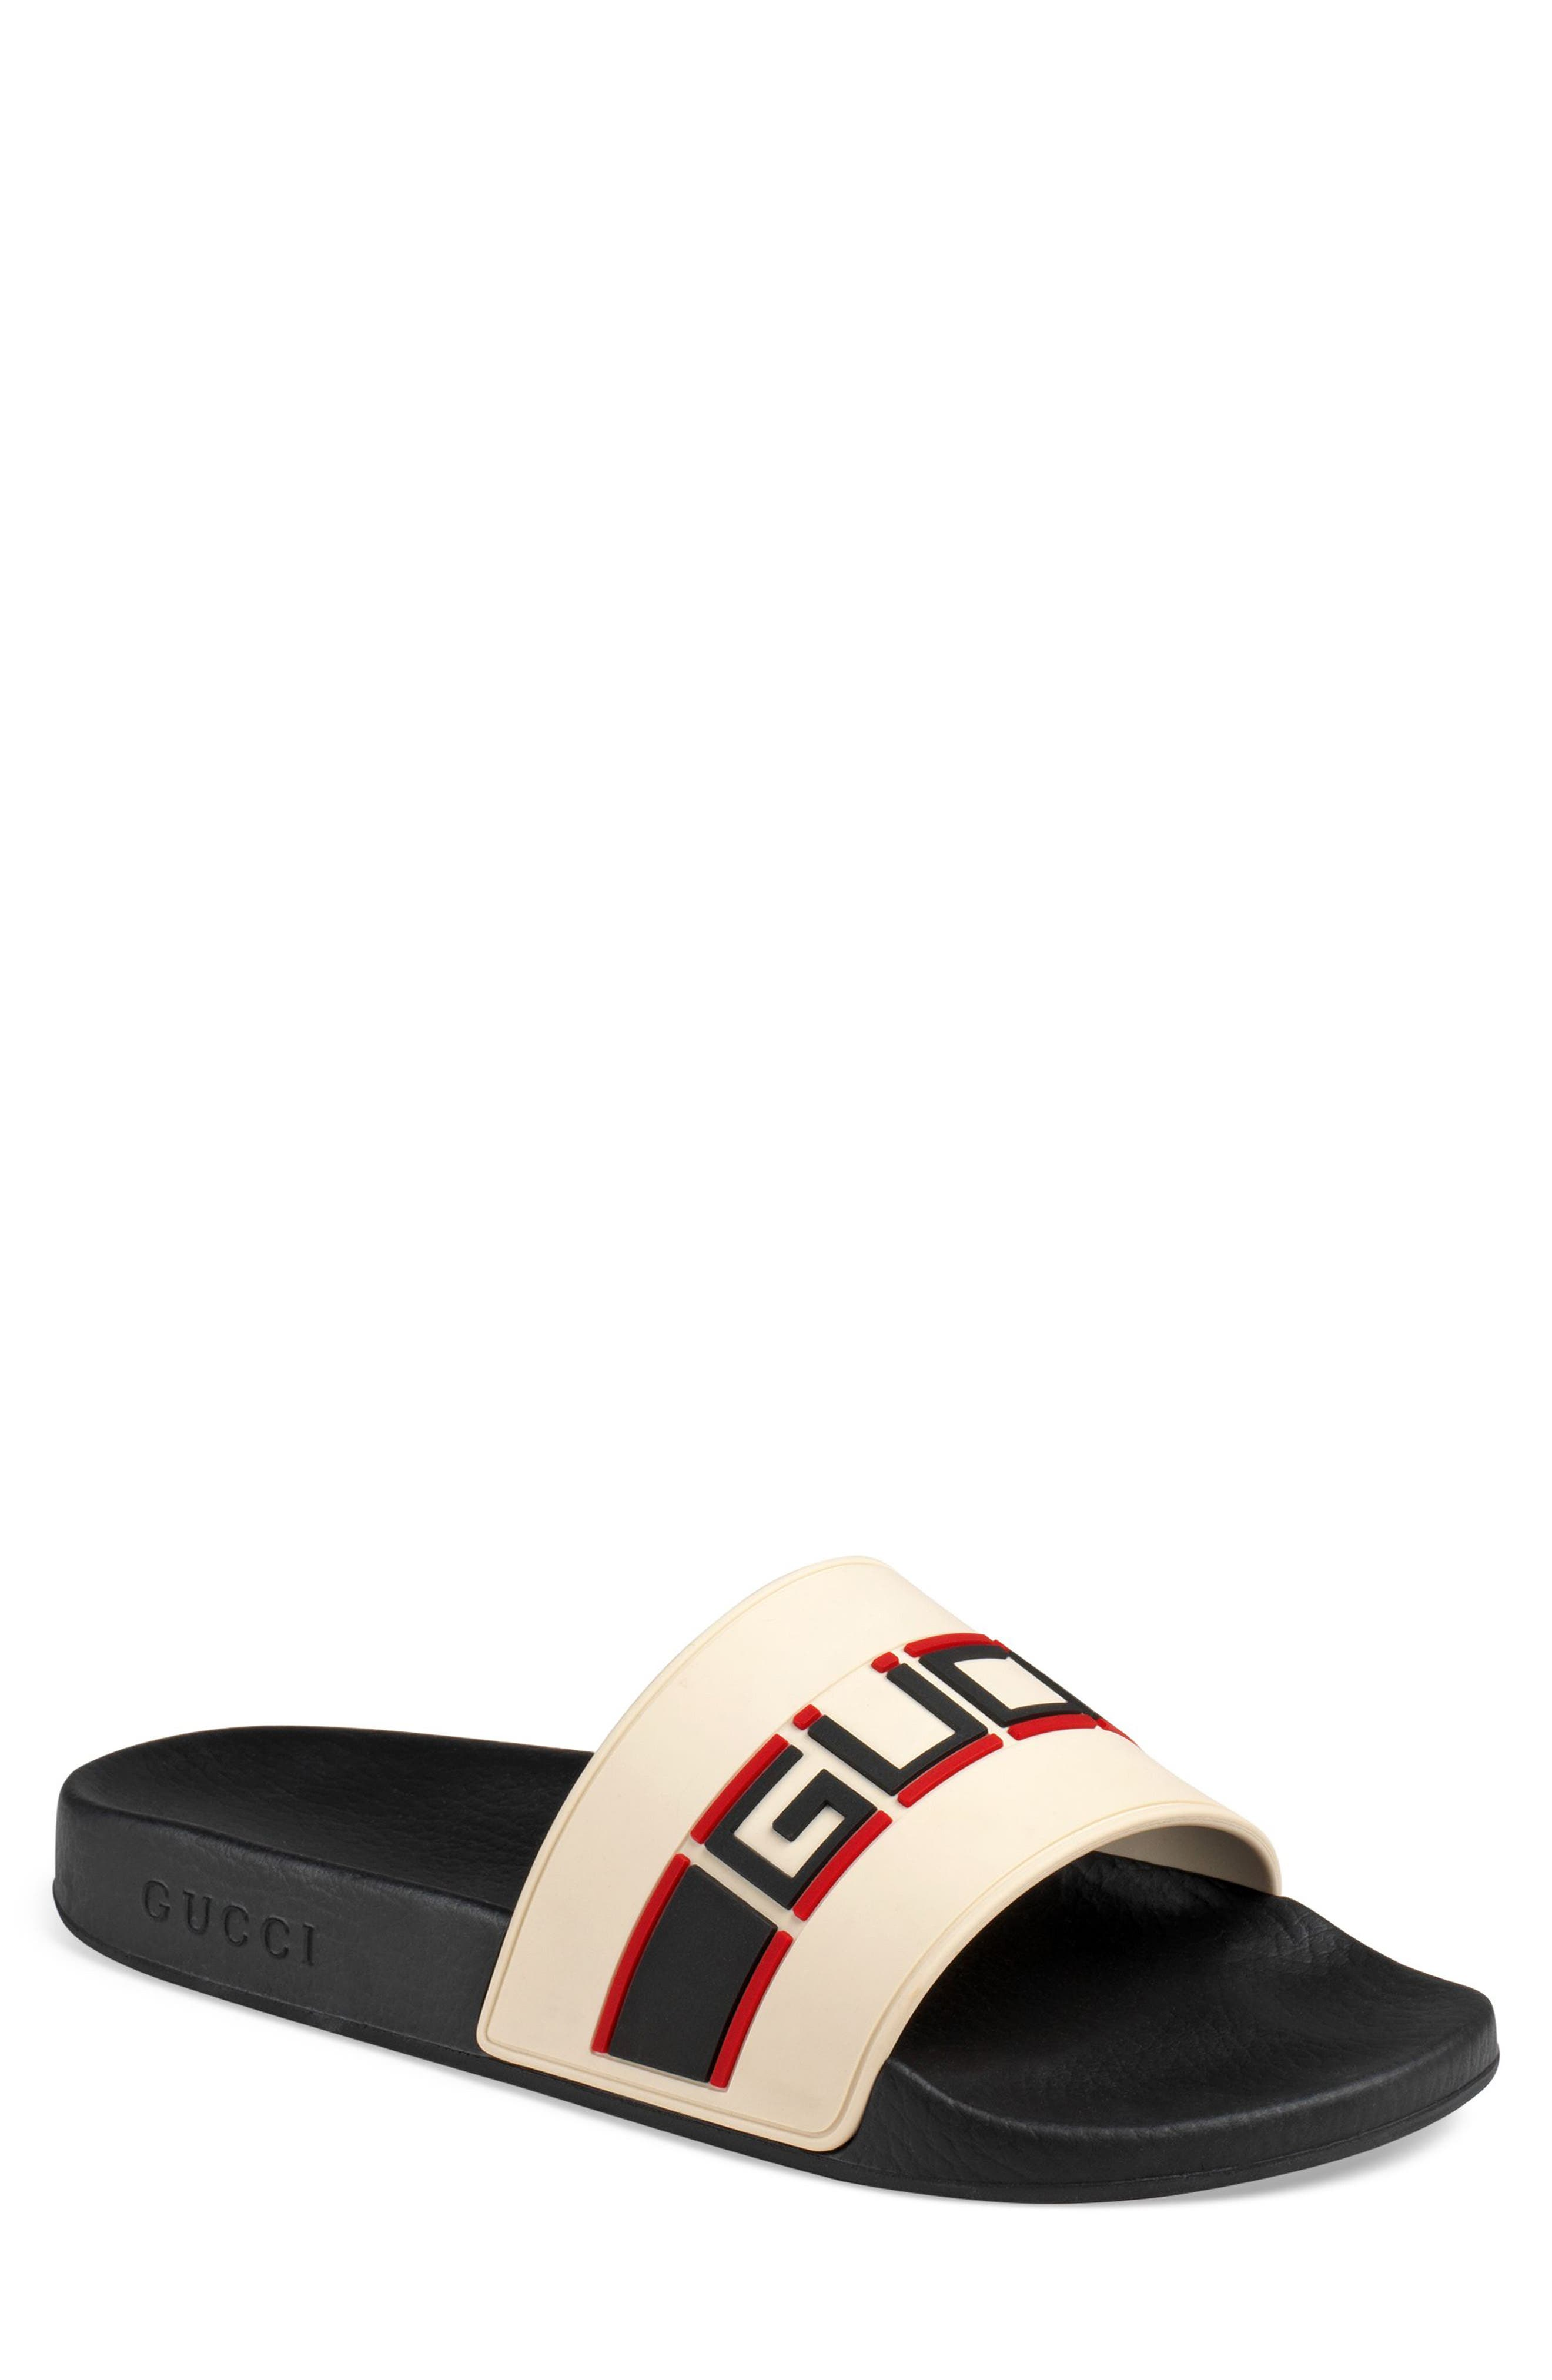 Pursuit Stripe Slide Sandal,                         Main,                         color, WHITE/ POPPY/ NERO